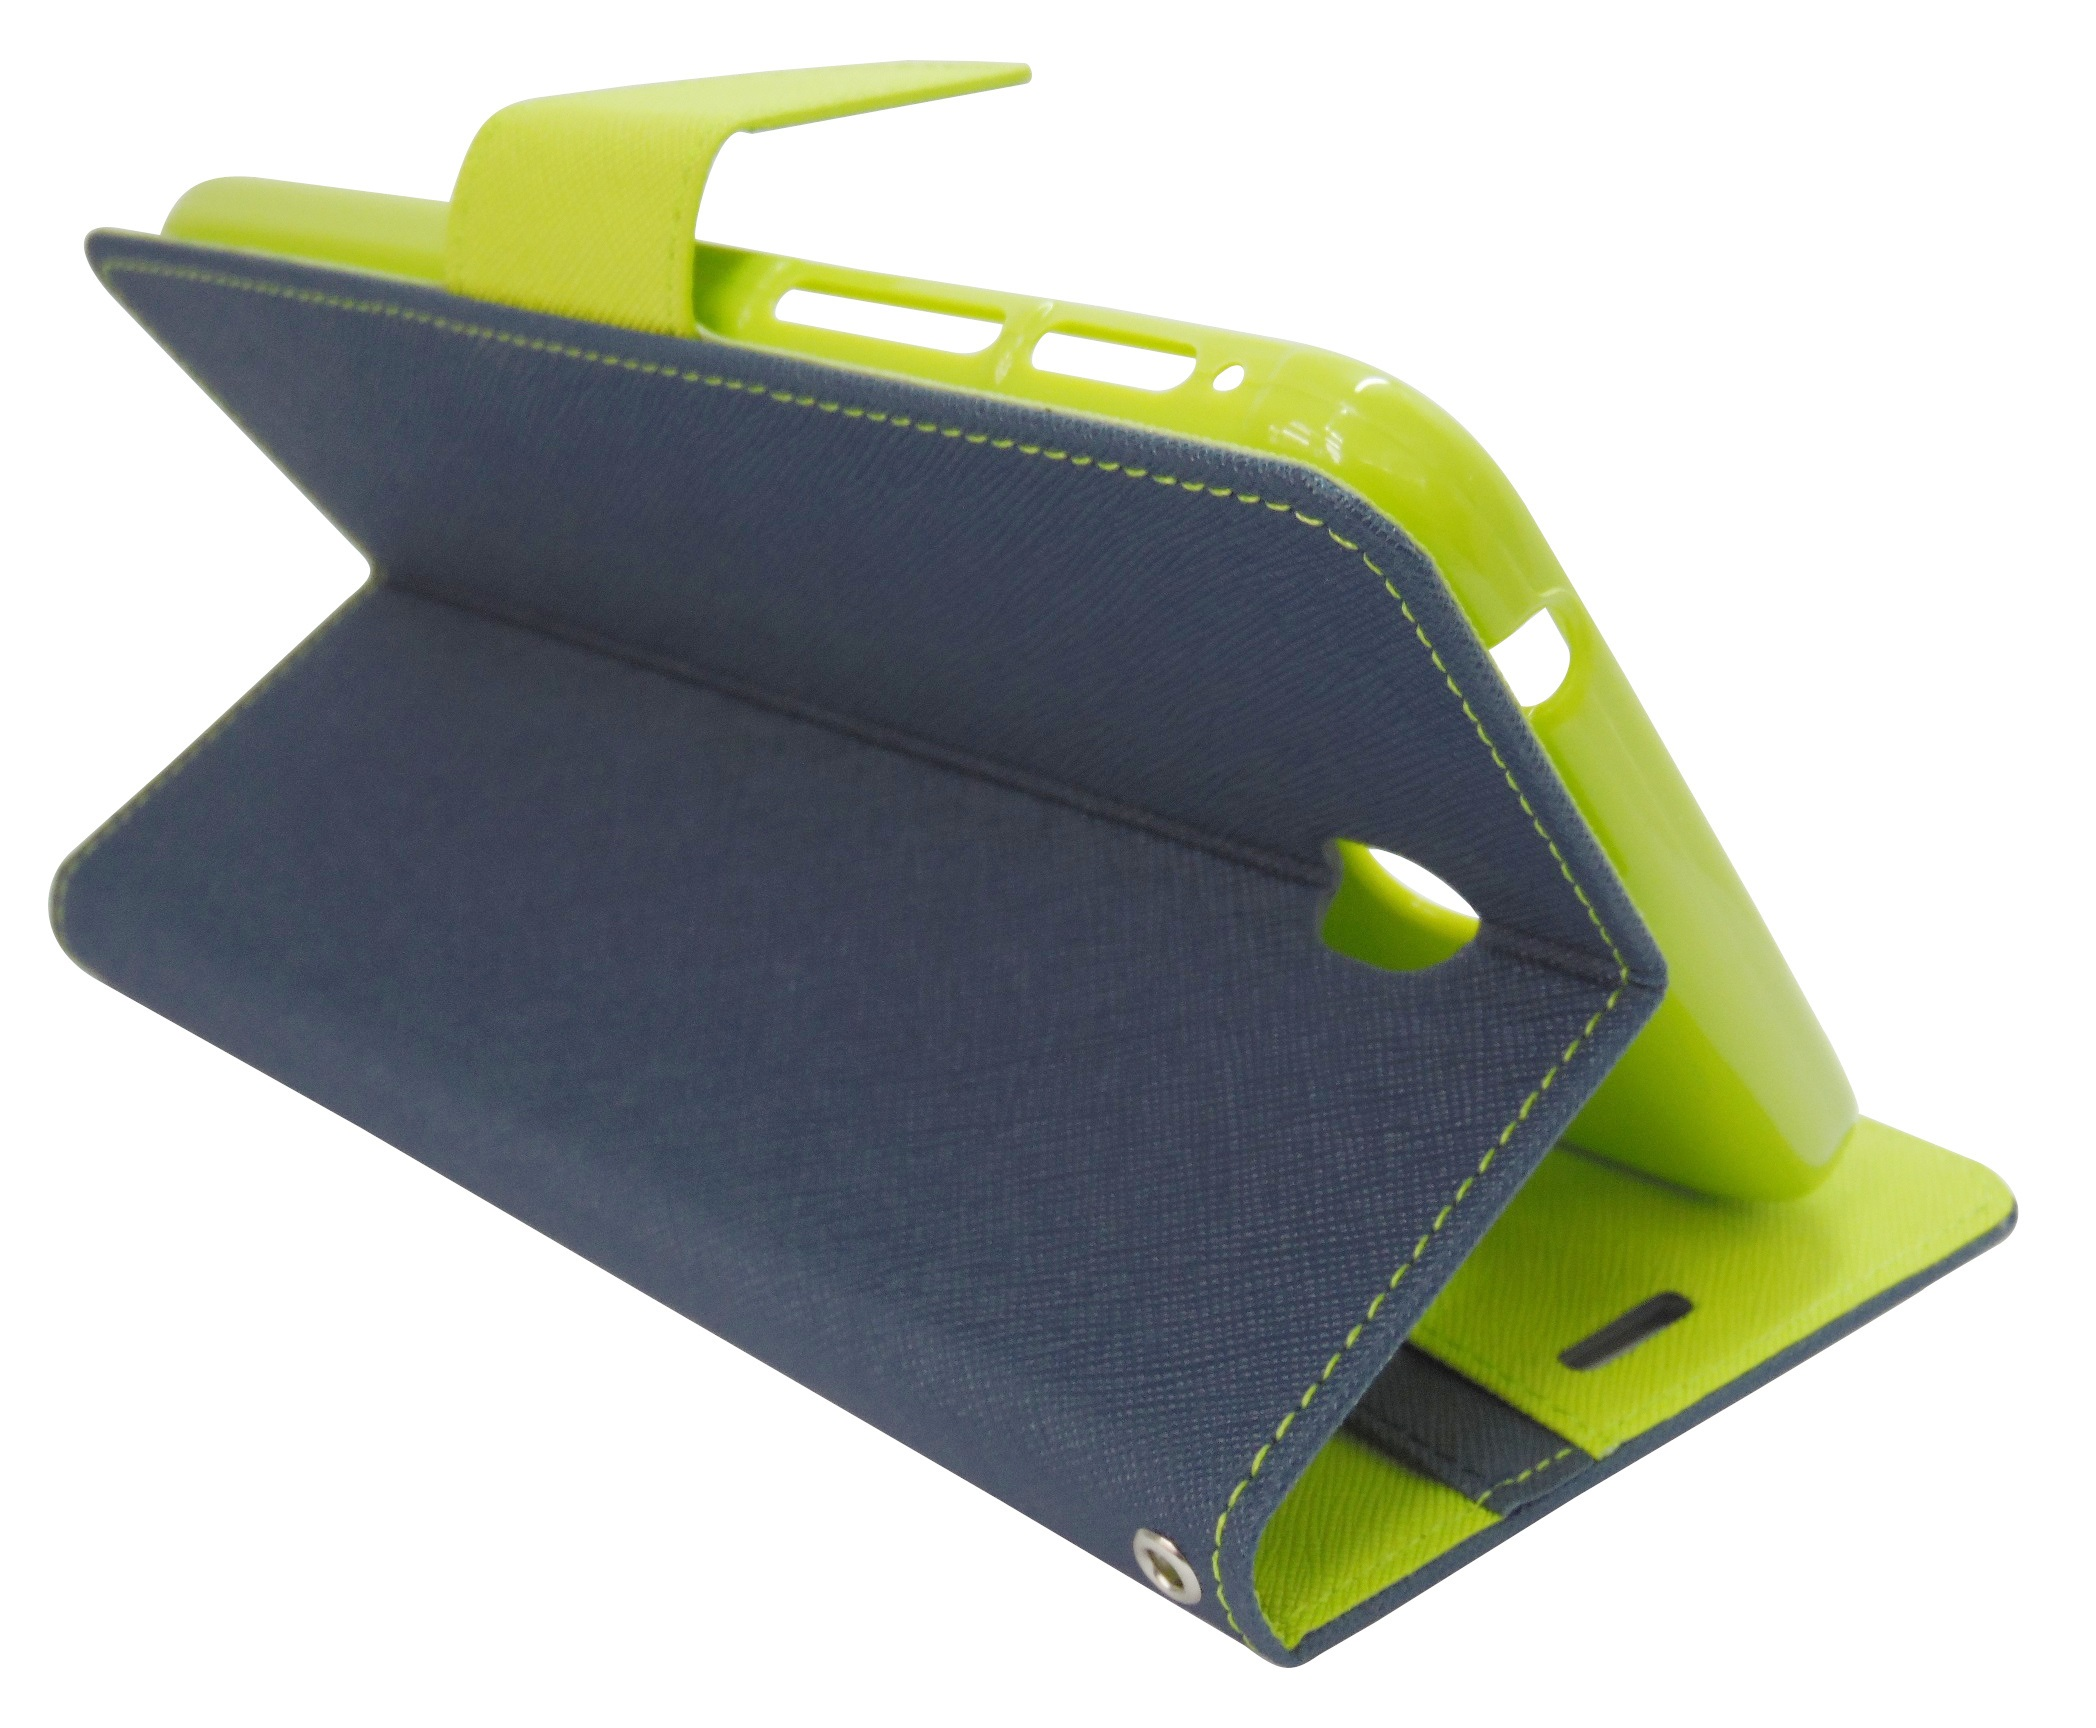 Husa tip carte Mercury Goospery Fancy Diary bleumarin + verde deschis pentru Samsung Galaxy Tab 3 P3200 (SM-T211) / P3210 (SM-T210)